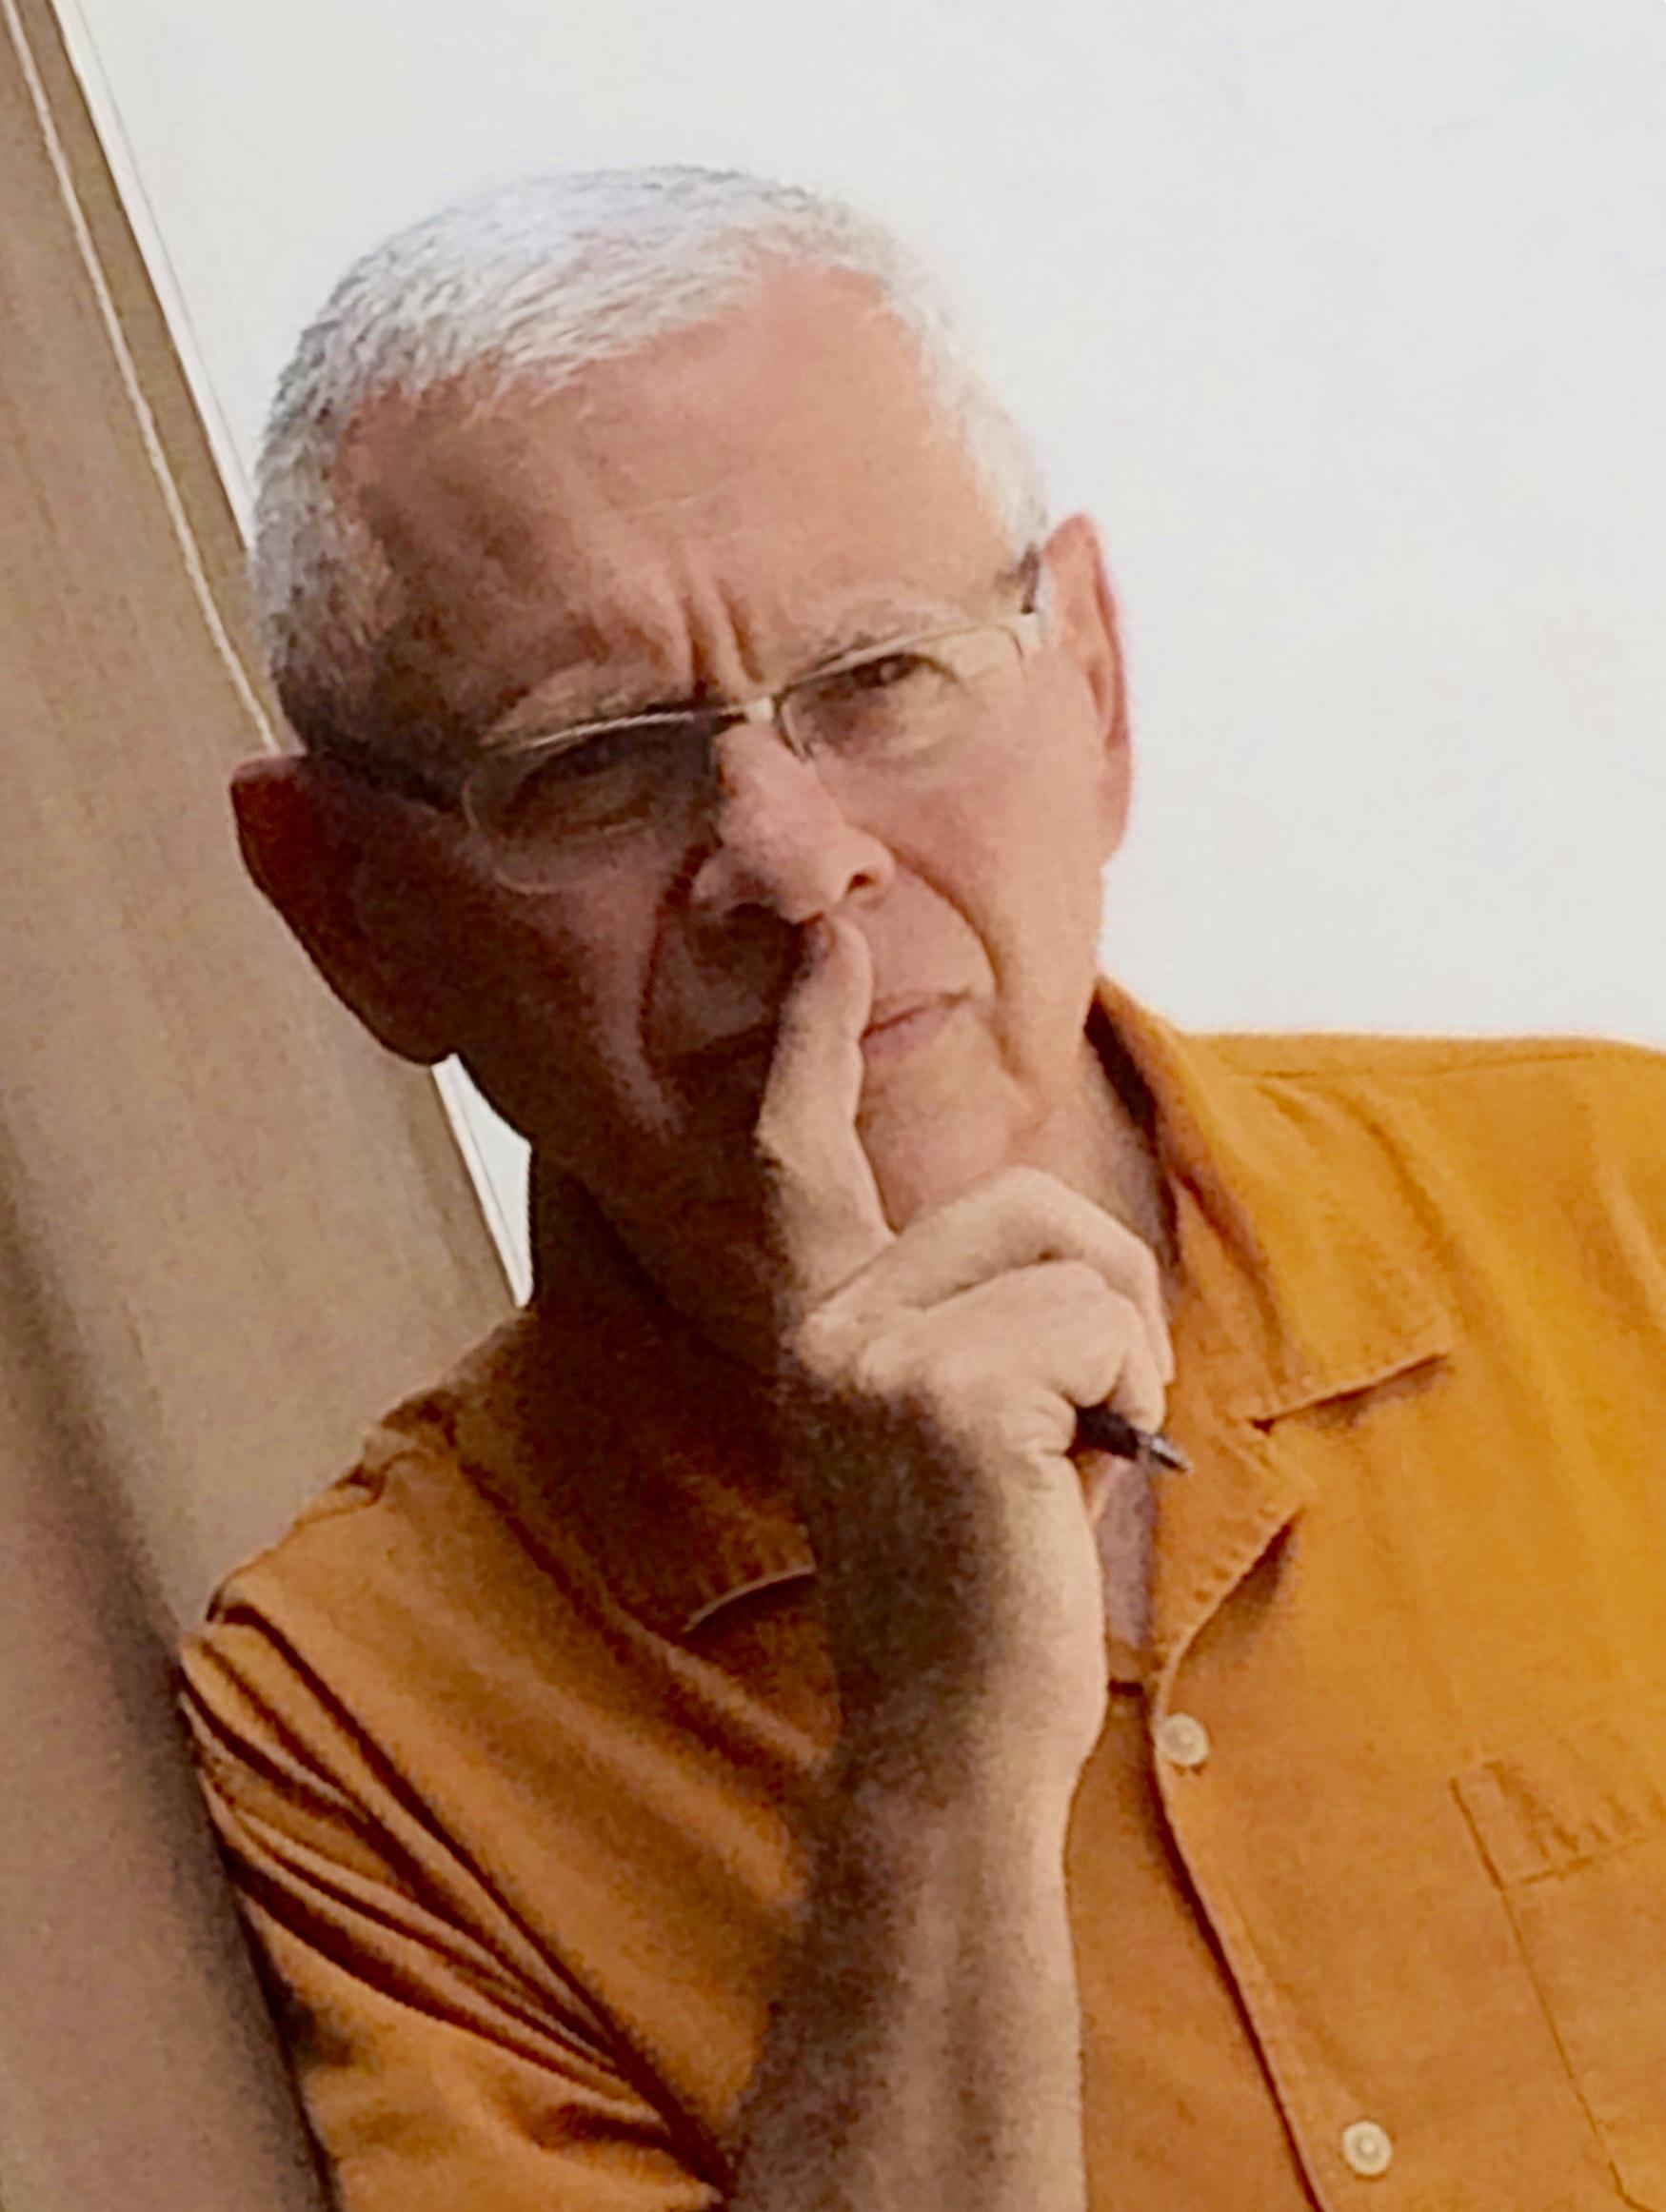 Nick Rabkin